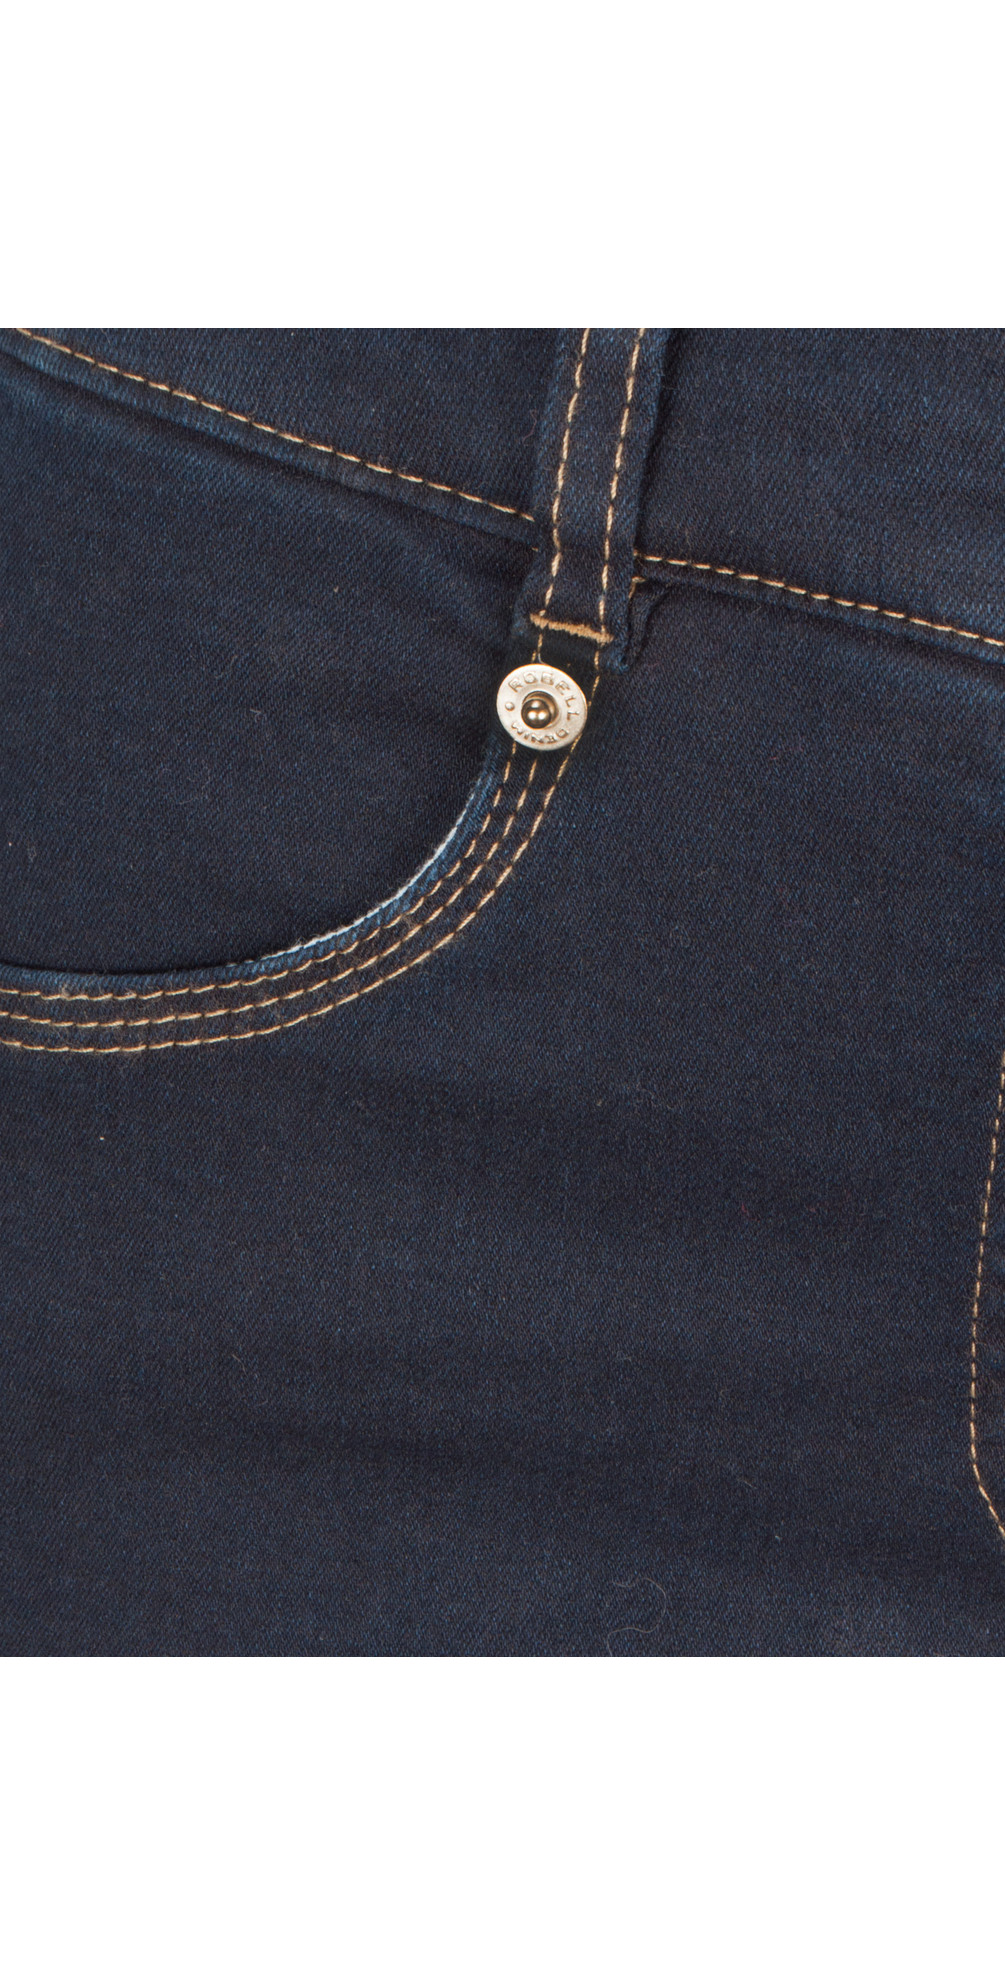 Star Jean main image